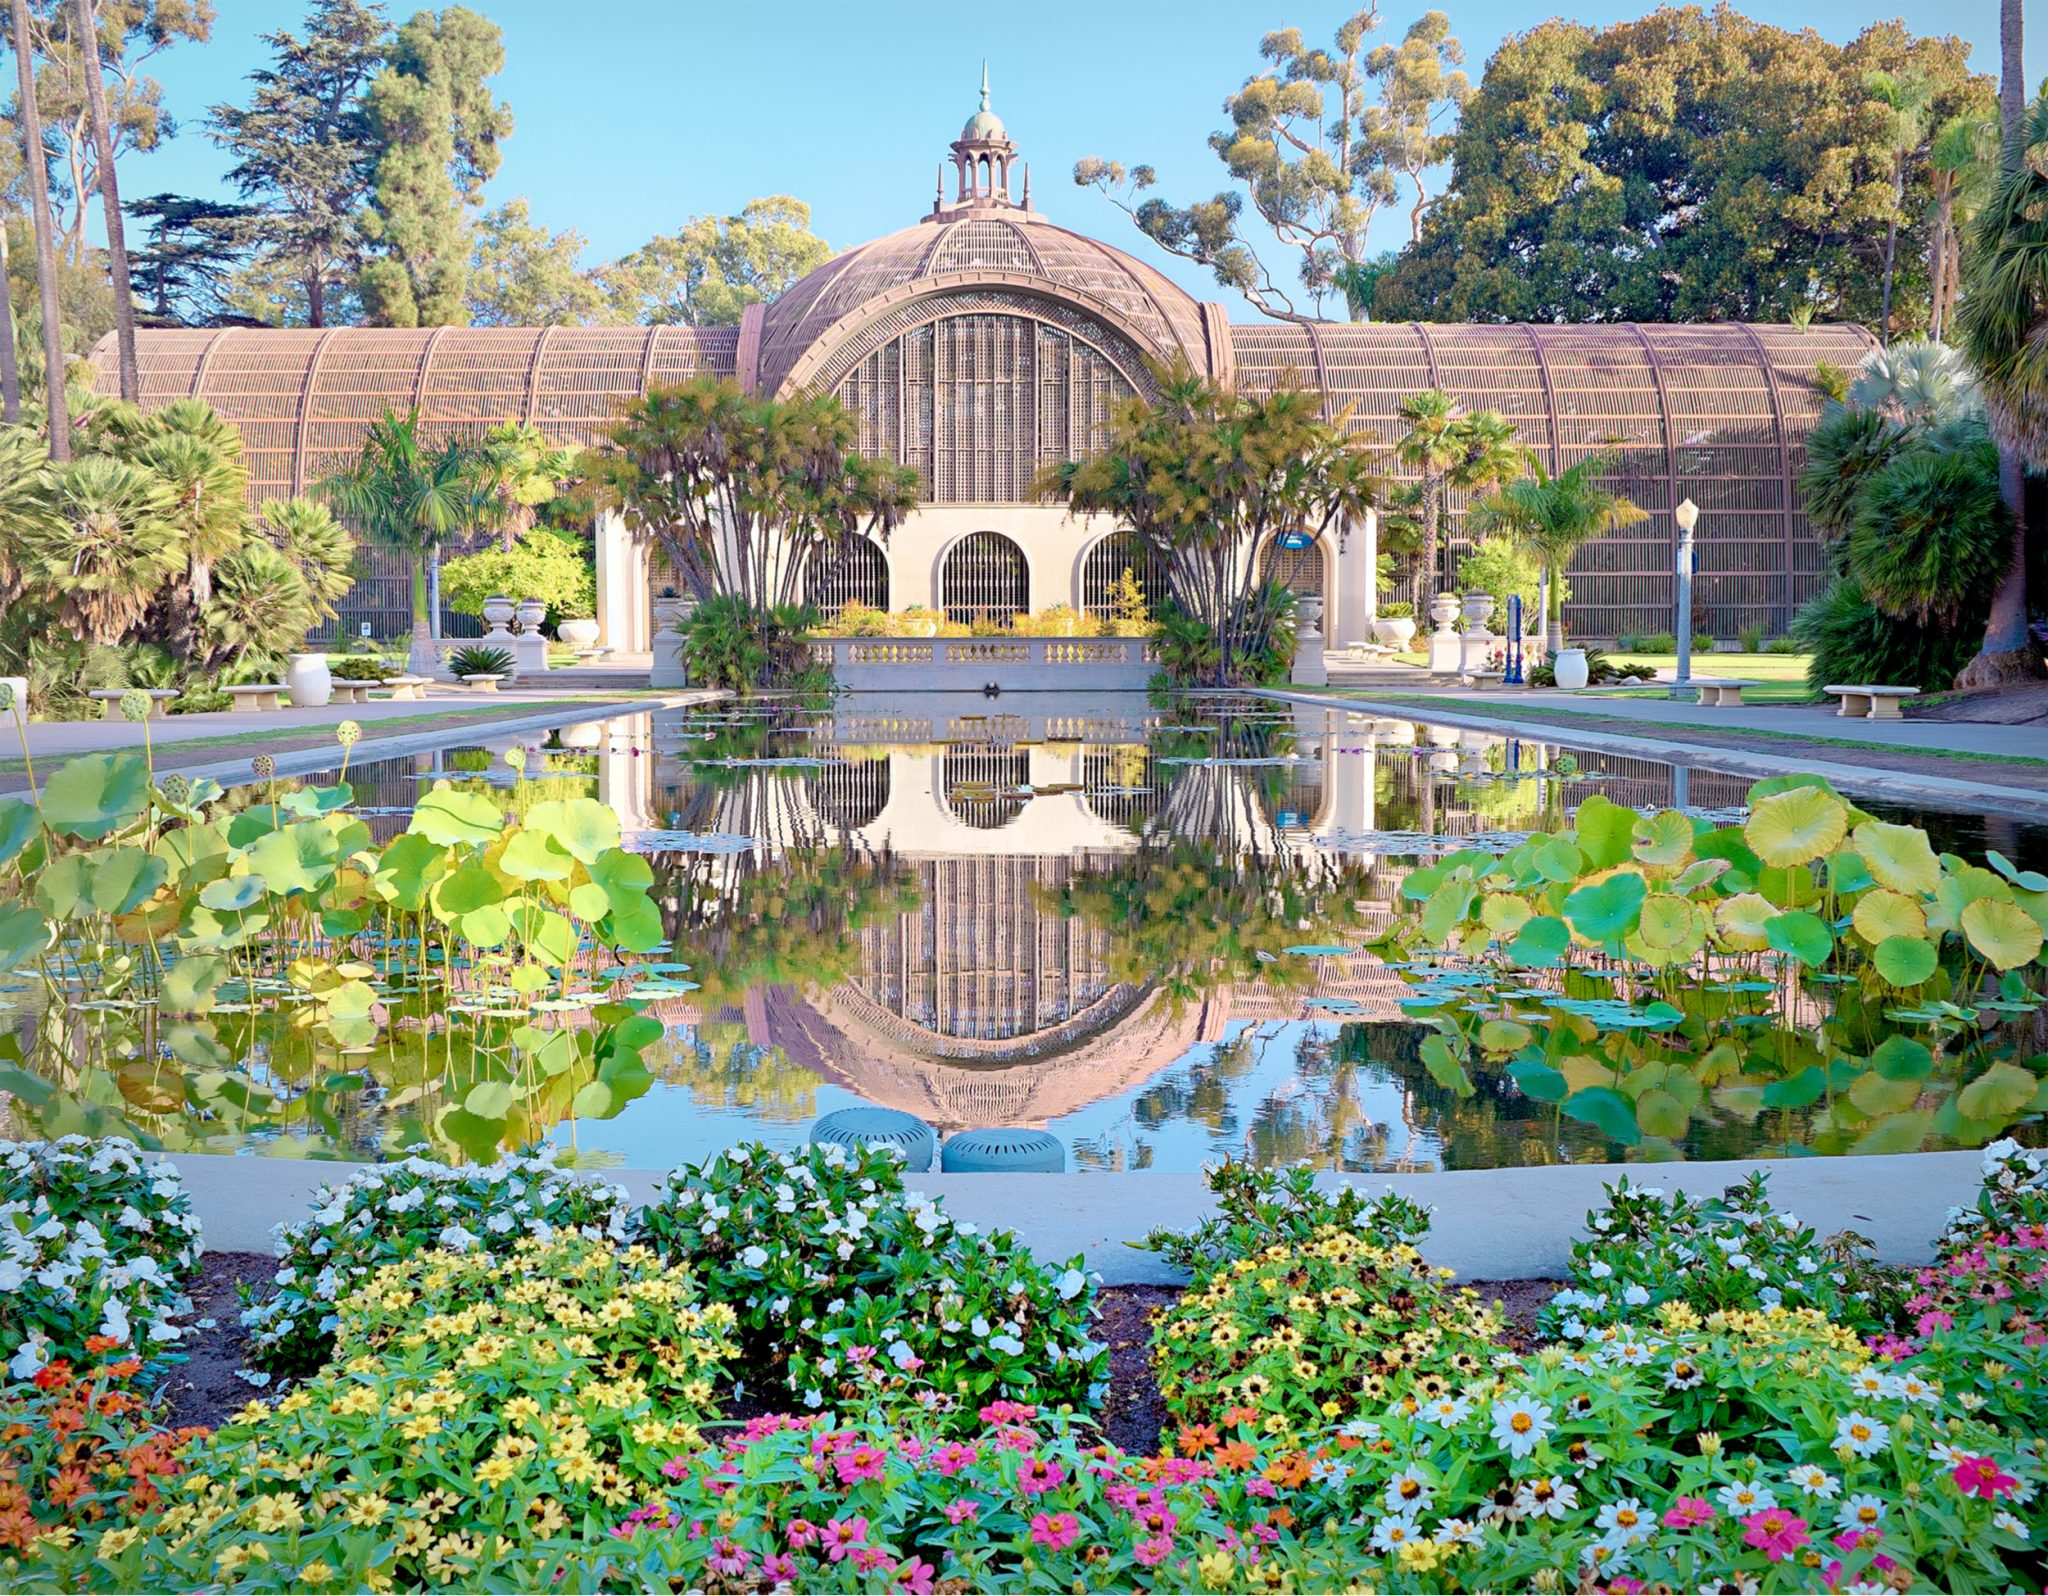 Botanical Gardens in San Diego County